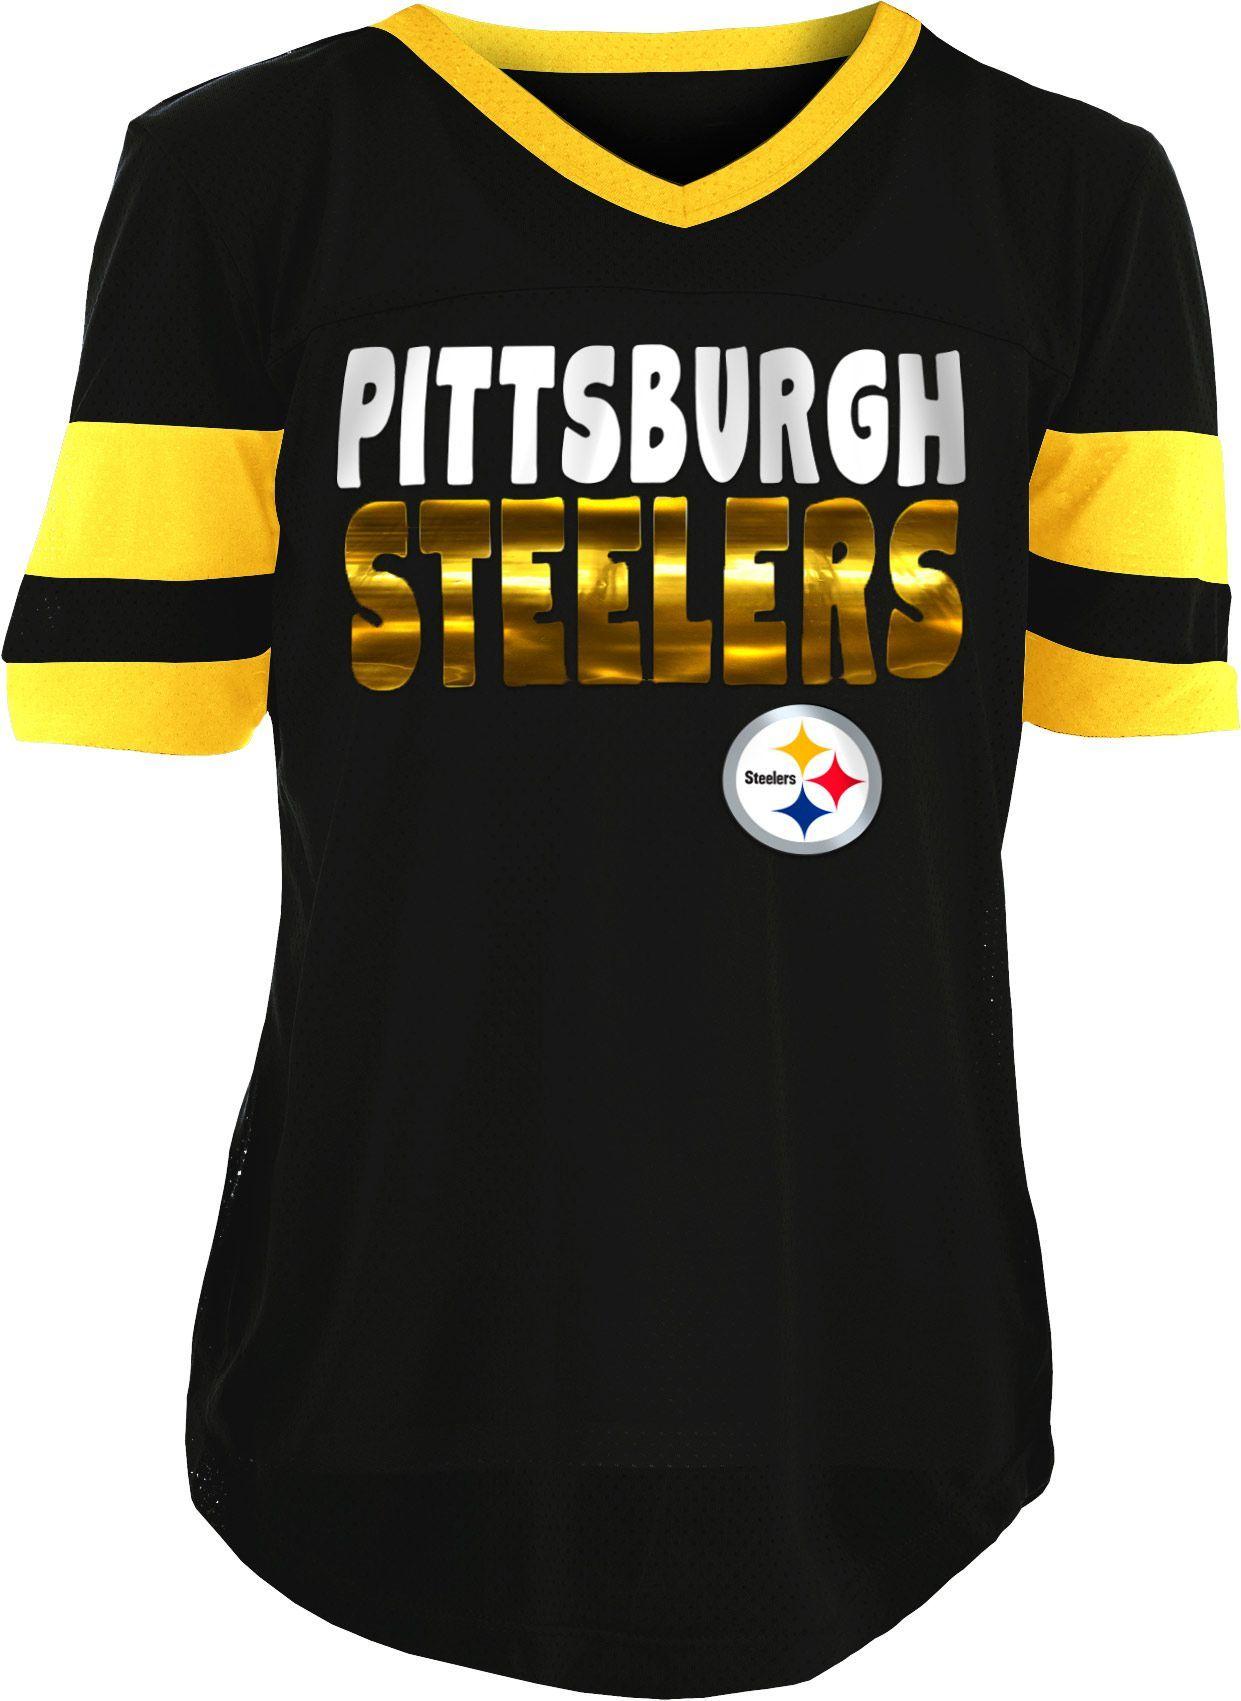 d6ee8da344edf NFL Team Apparel Girls' Pittsburgh Steelers Mesh Black Jersey Top ...